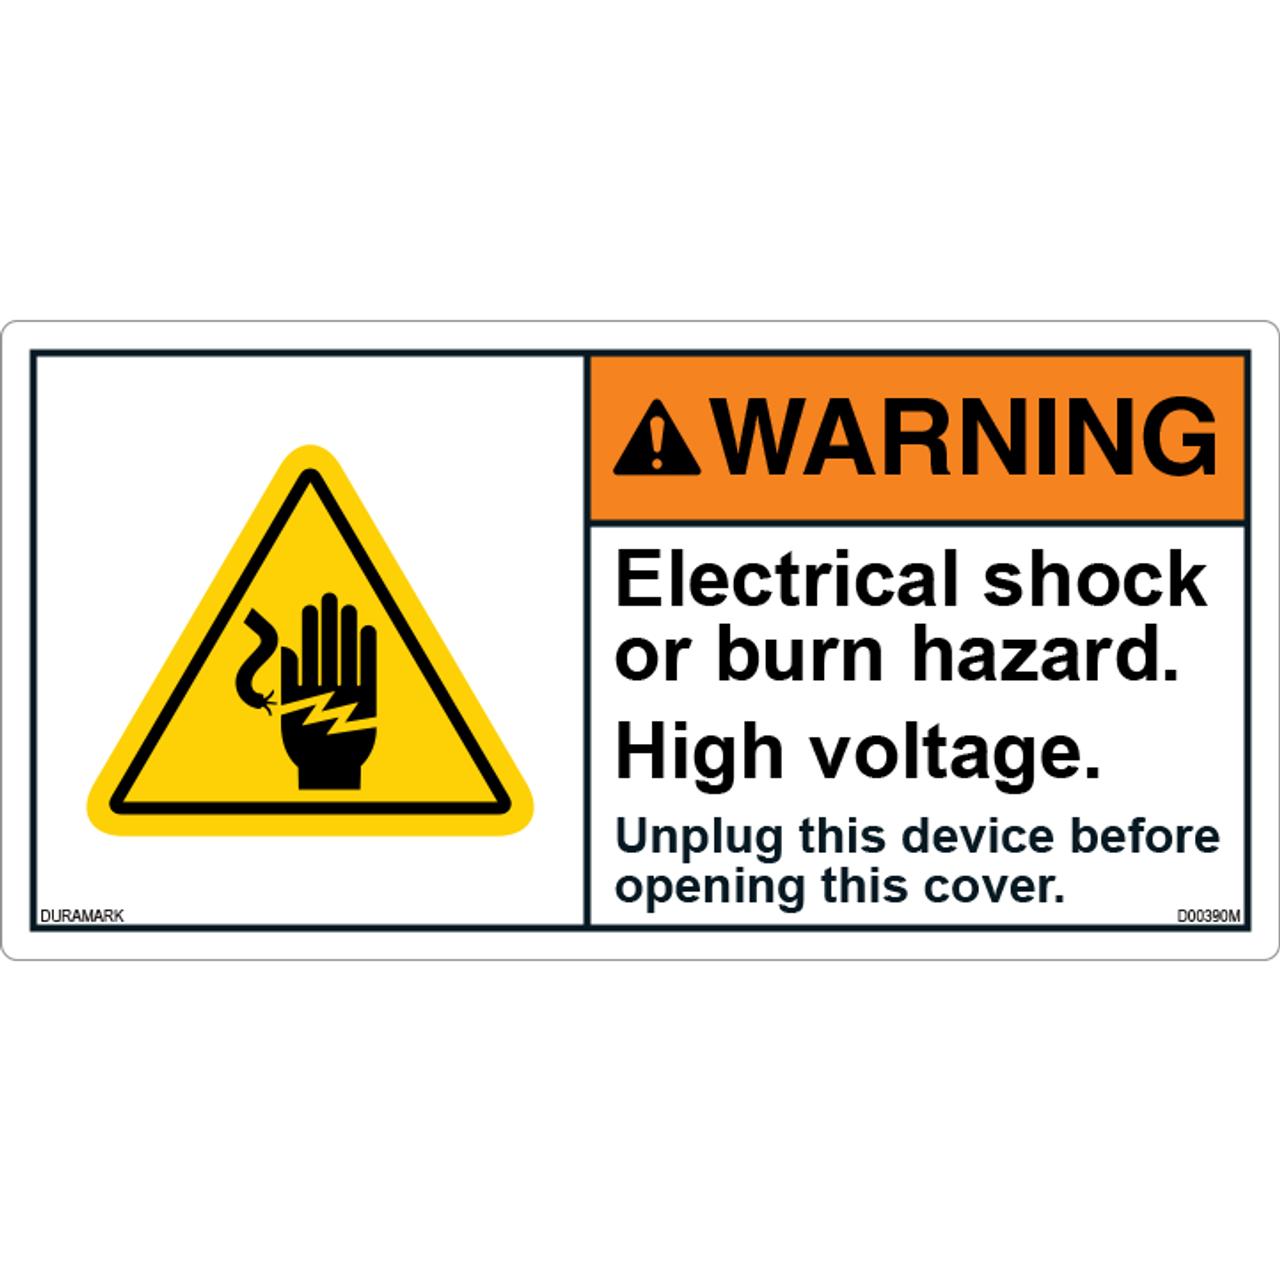 ANSI Safety Label - Warning - Electrical Shock - High Voltage